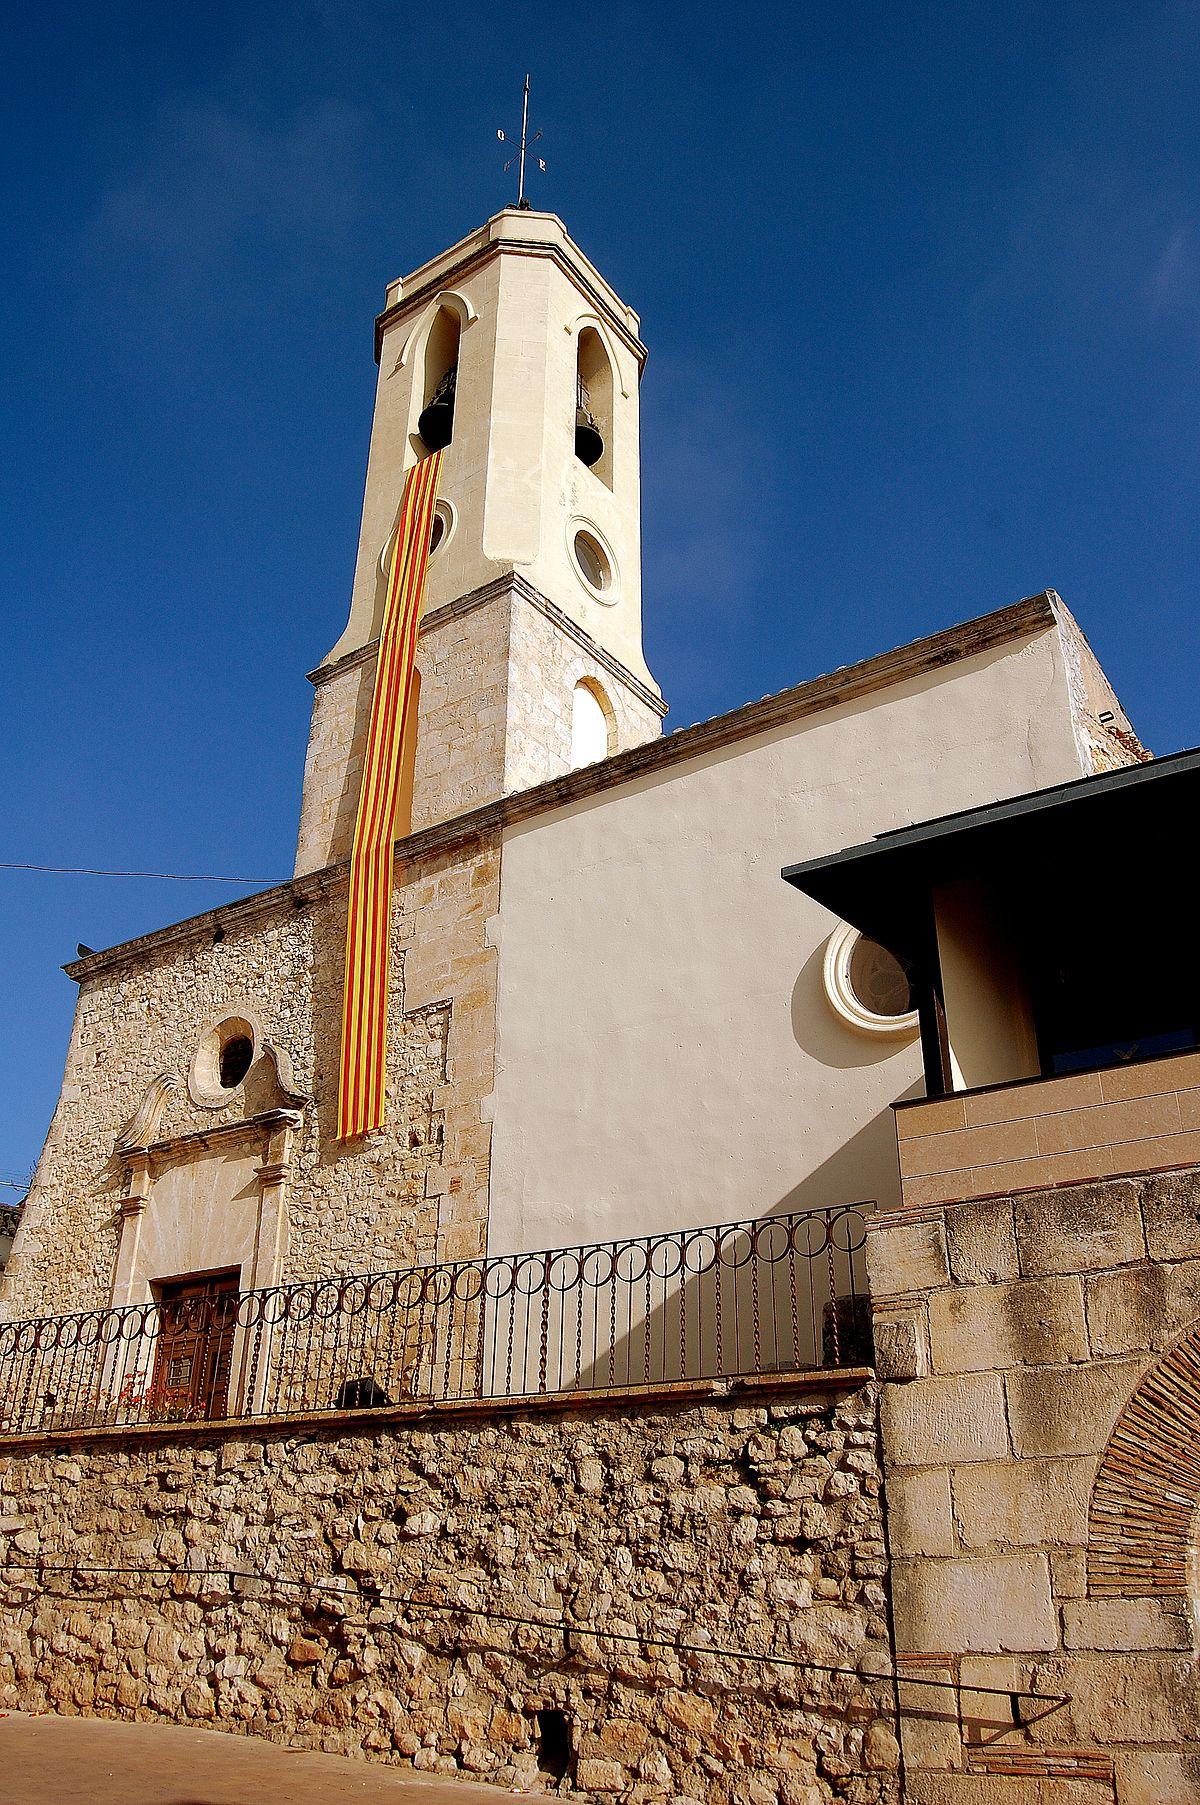 Esgl sia de sant cugat sant cugat sesgarrigues - Arquitectura sant cugat ...